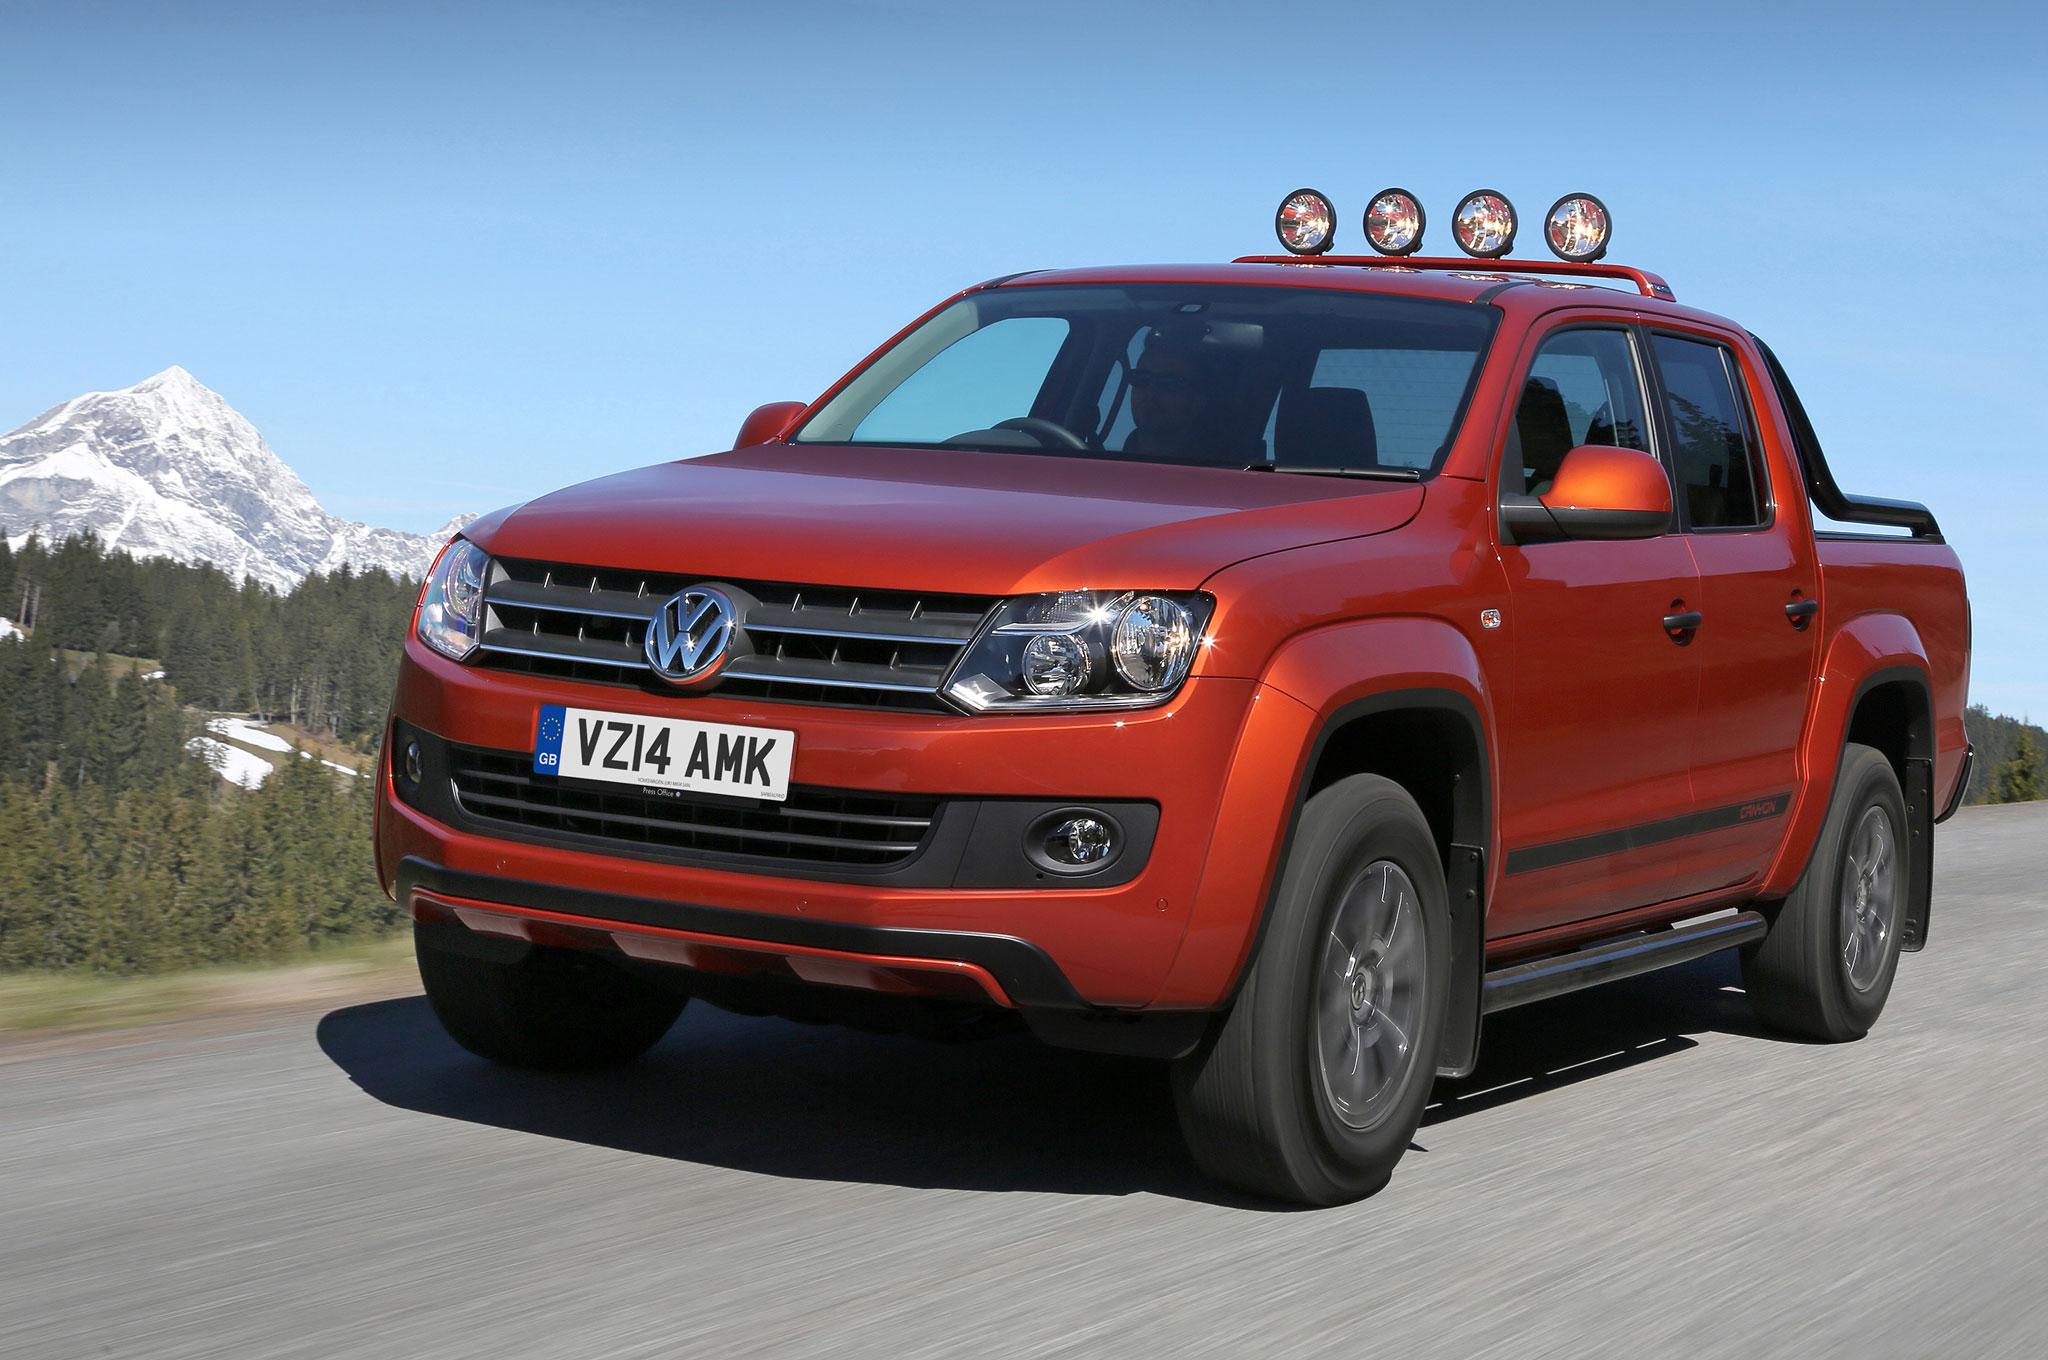 2014 Volkswagen Amarok Canyon Review Vw 2 0 Petrol Engine Diagram Show More